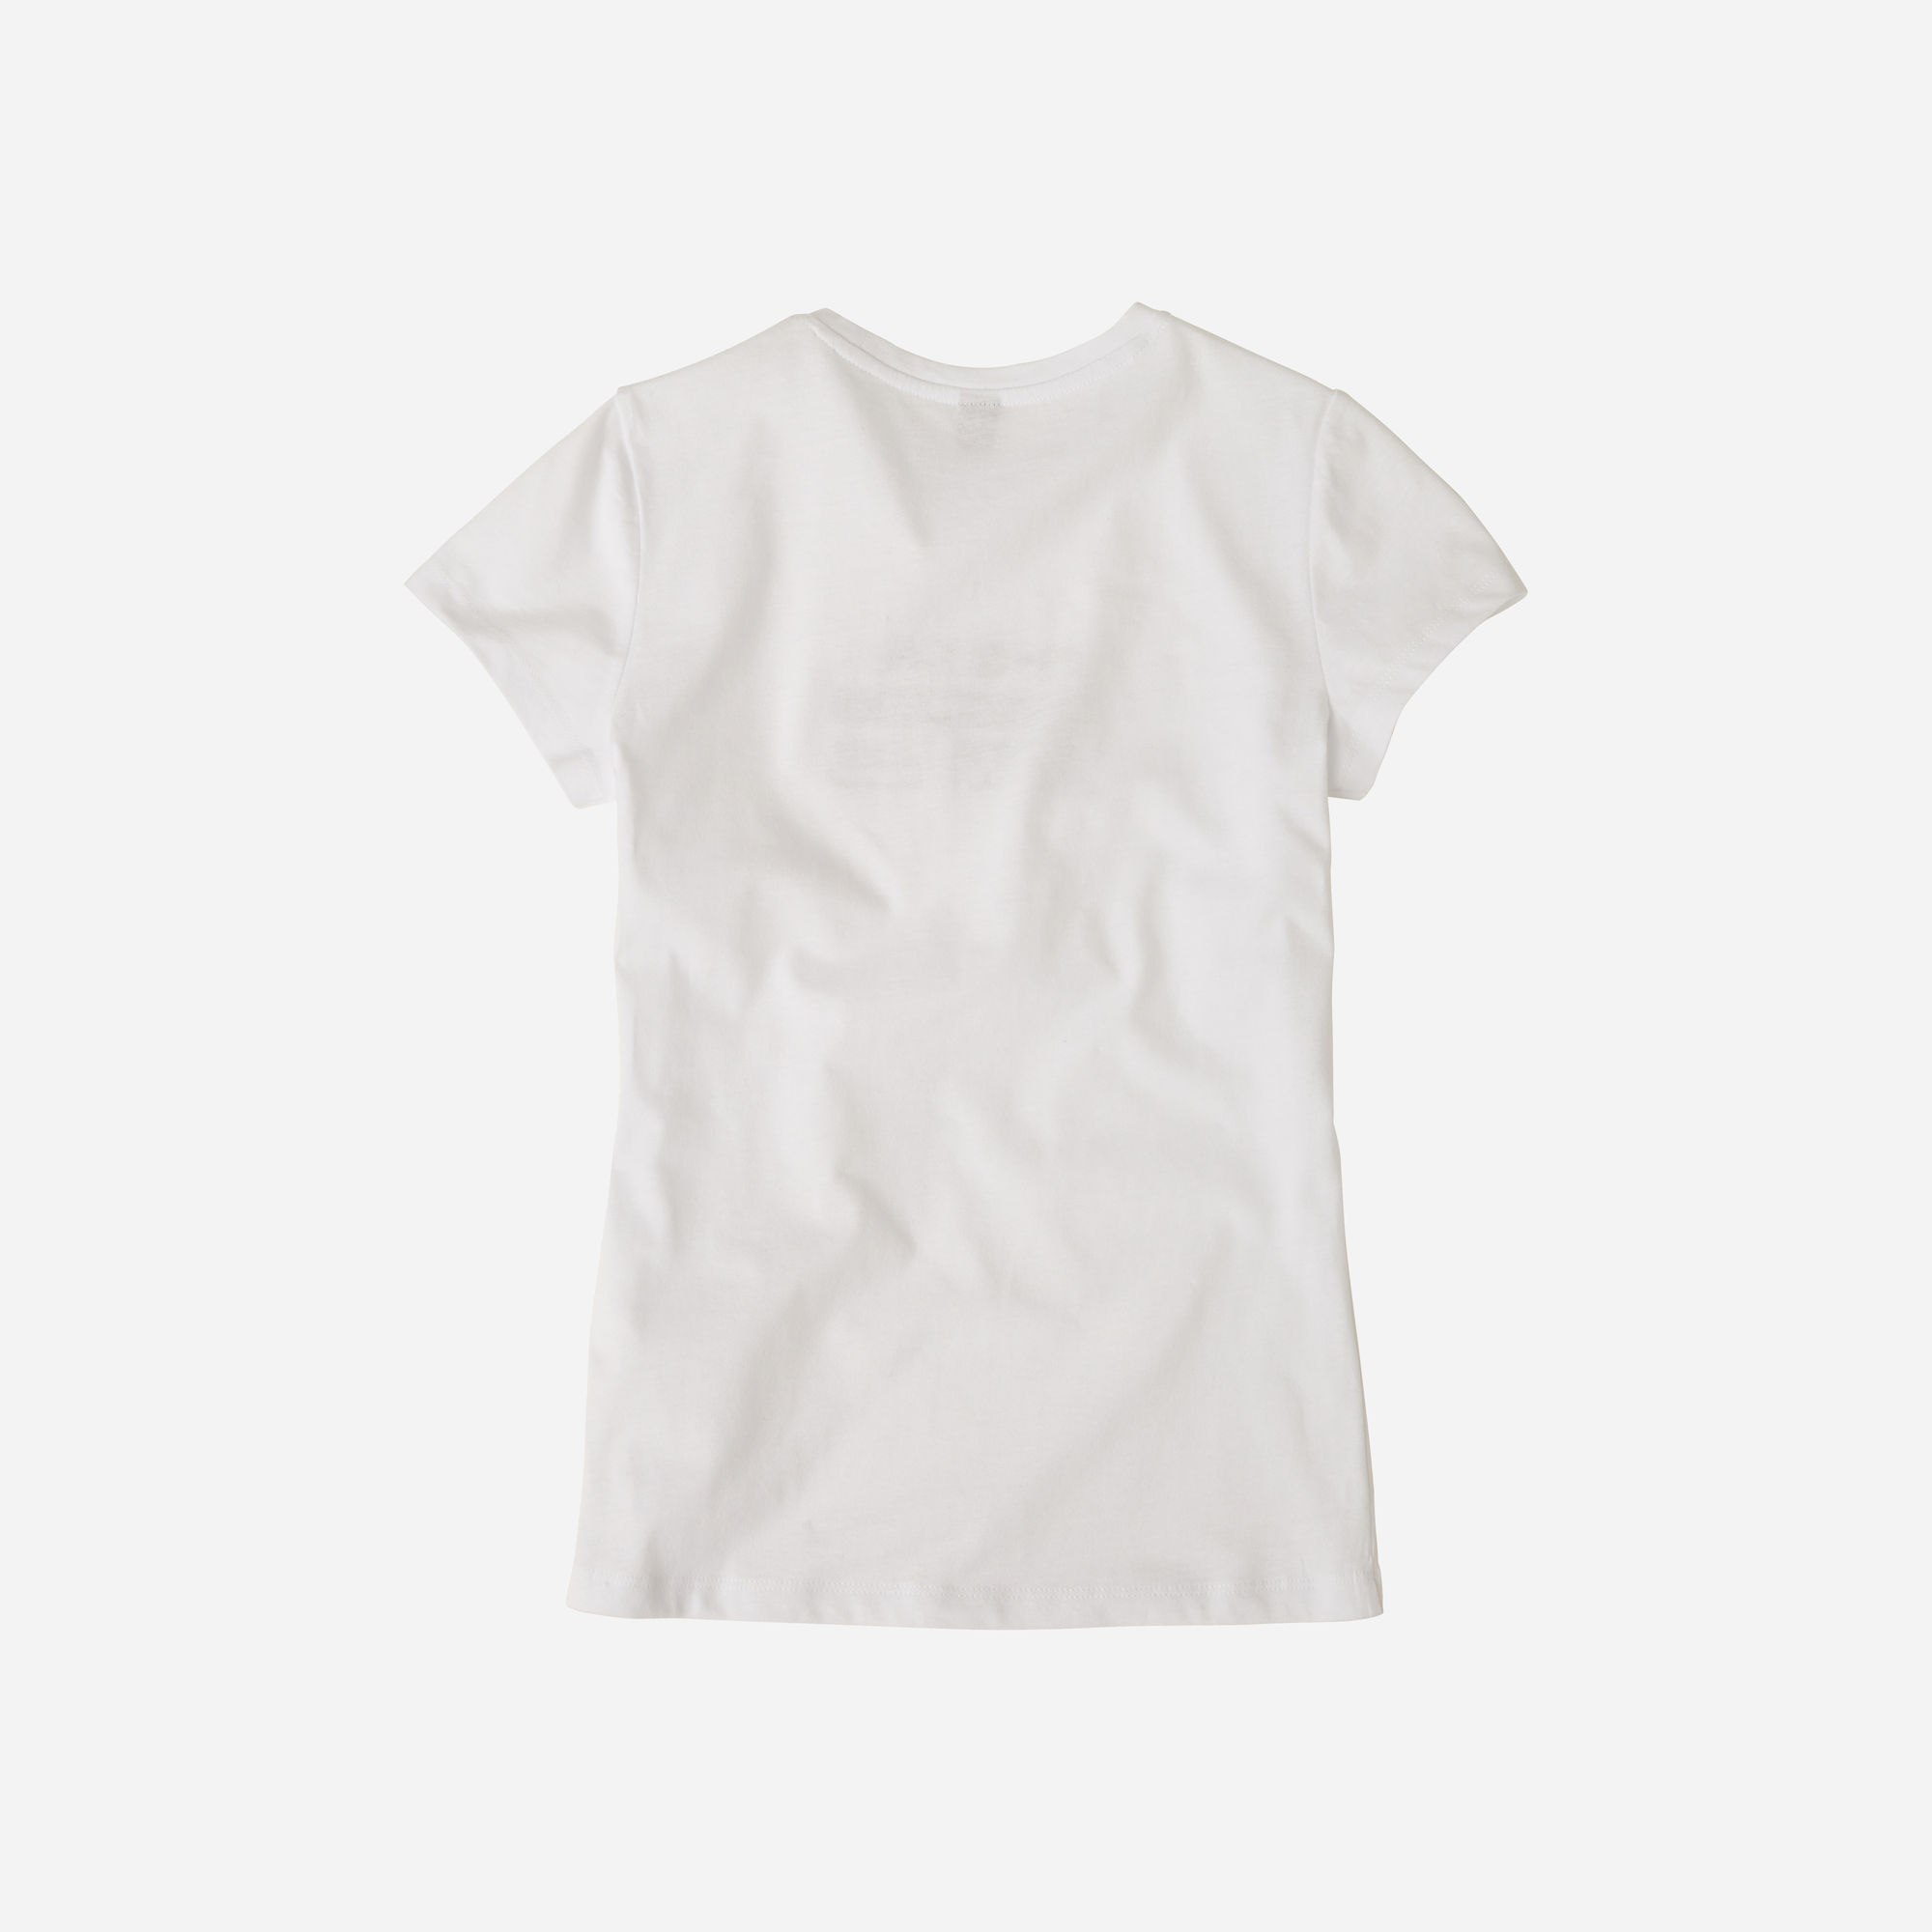 G-Star RAW Graphic Logo T-Shirt 12 White